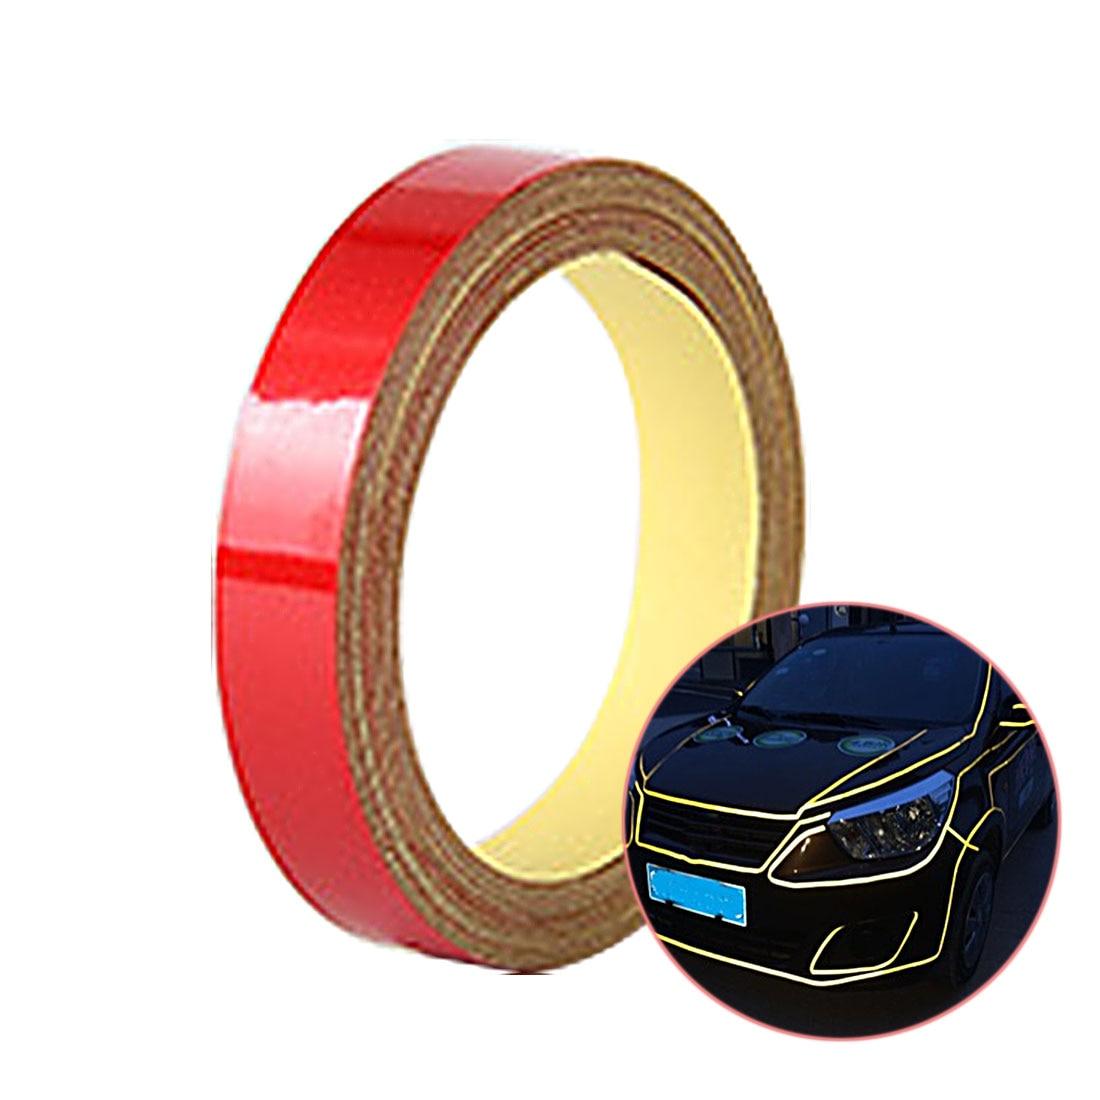 Dewtreetali Night Magic Reflective Tape 1cm 5m Automotive Body Motorcycle Decoration for opel toyota kia bmw